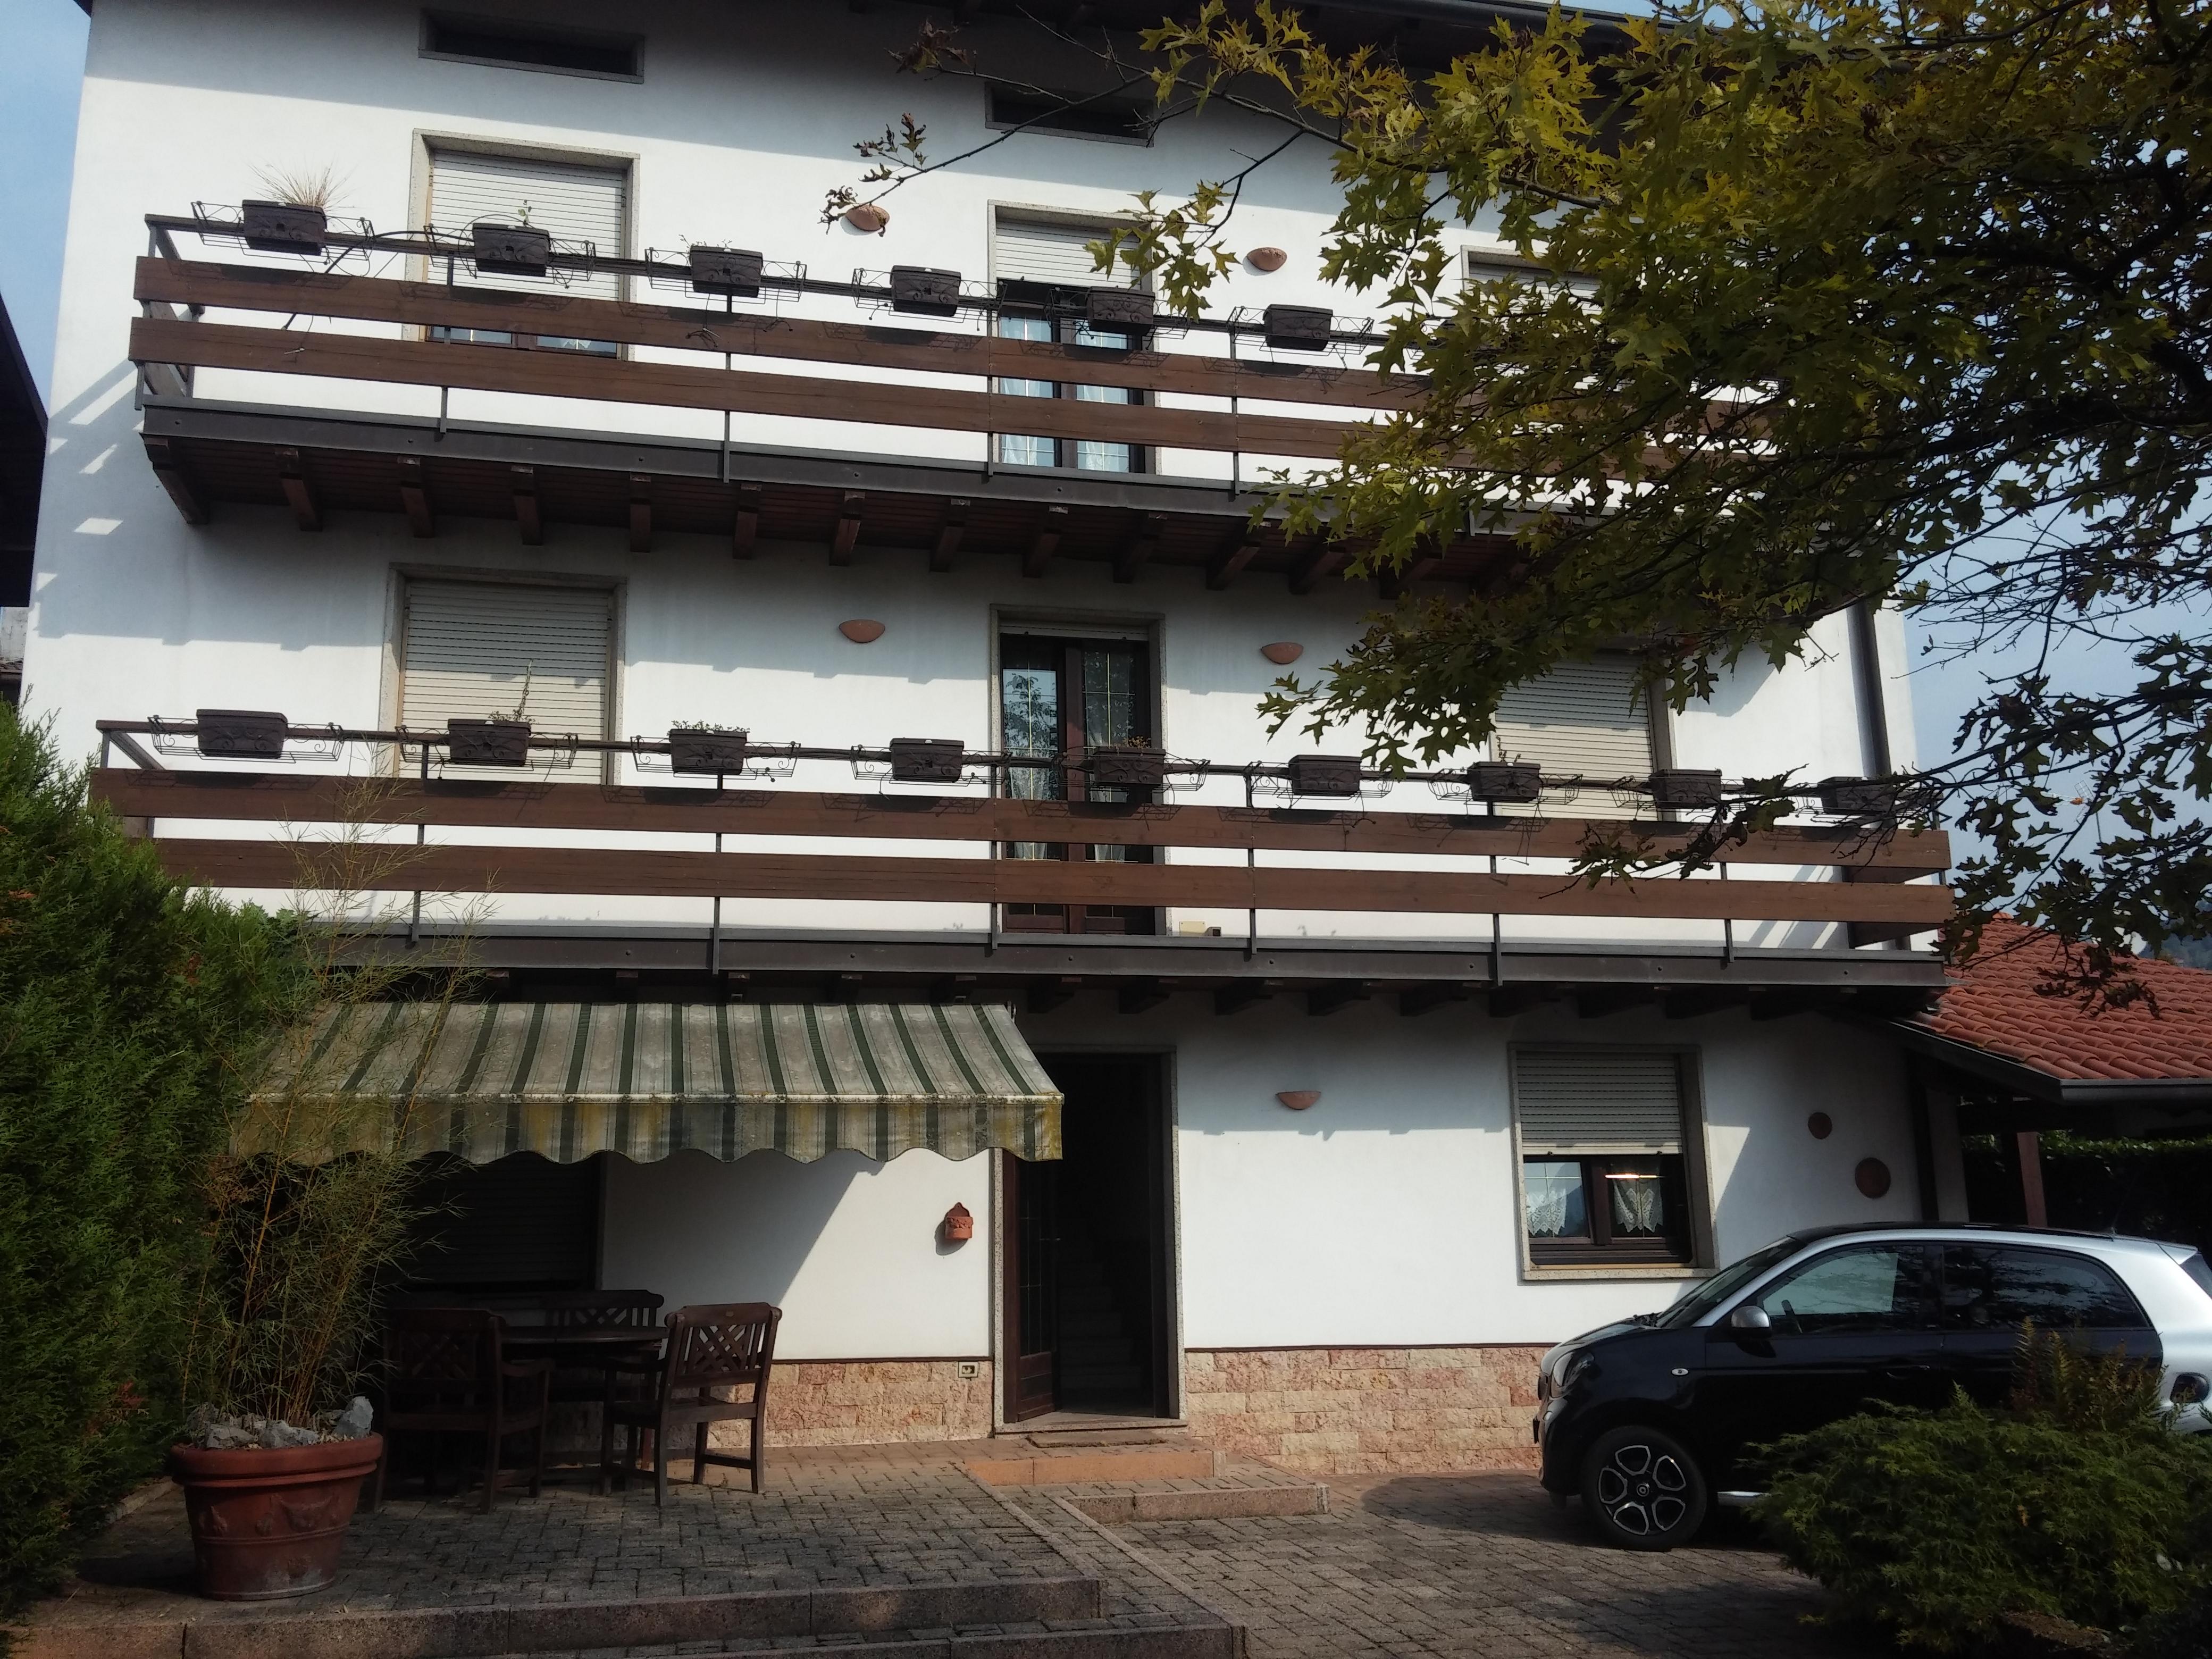 Vendita casa indipendente valle imagna bergamo italia for Casa indipendente bergamo